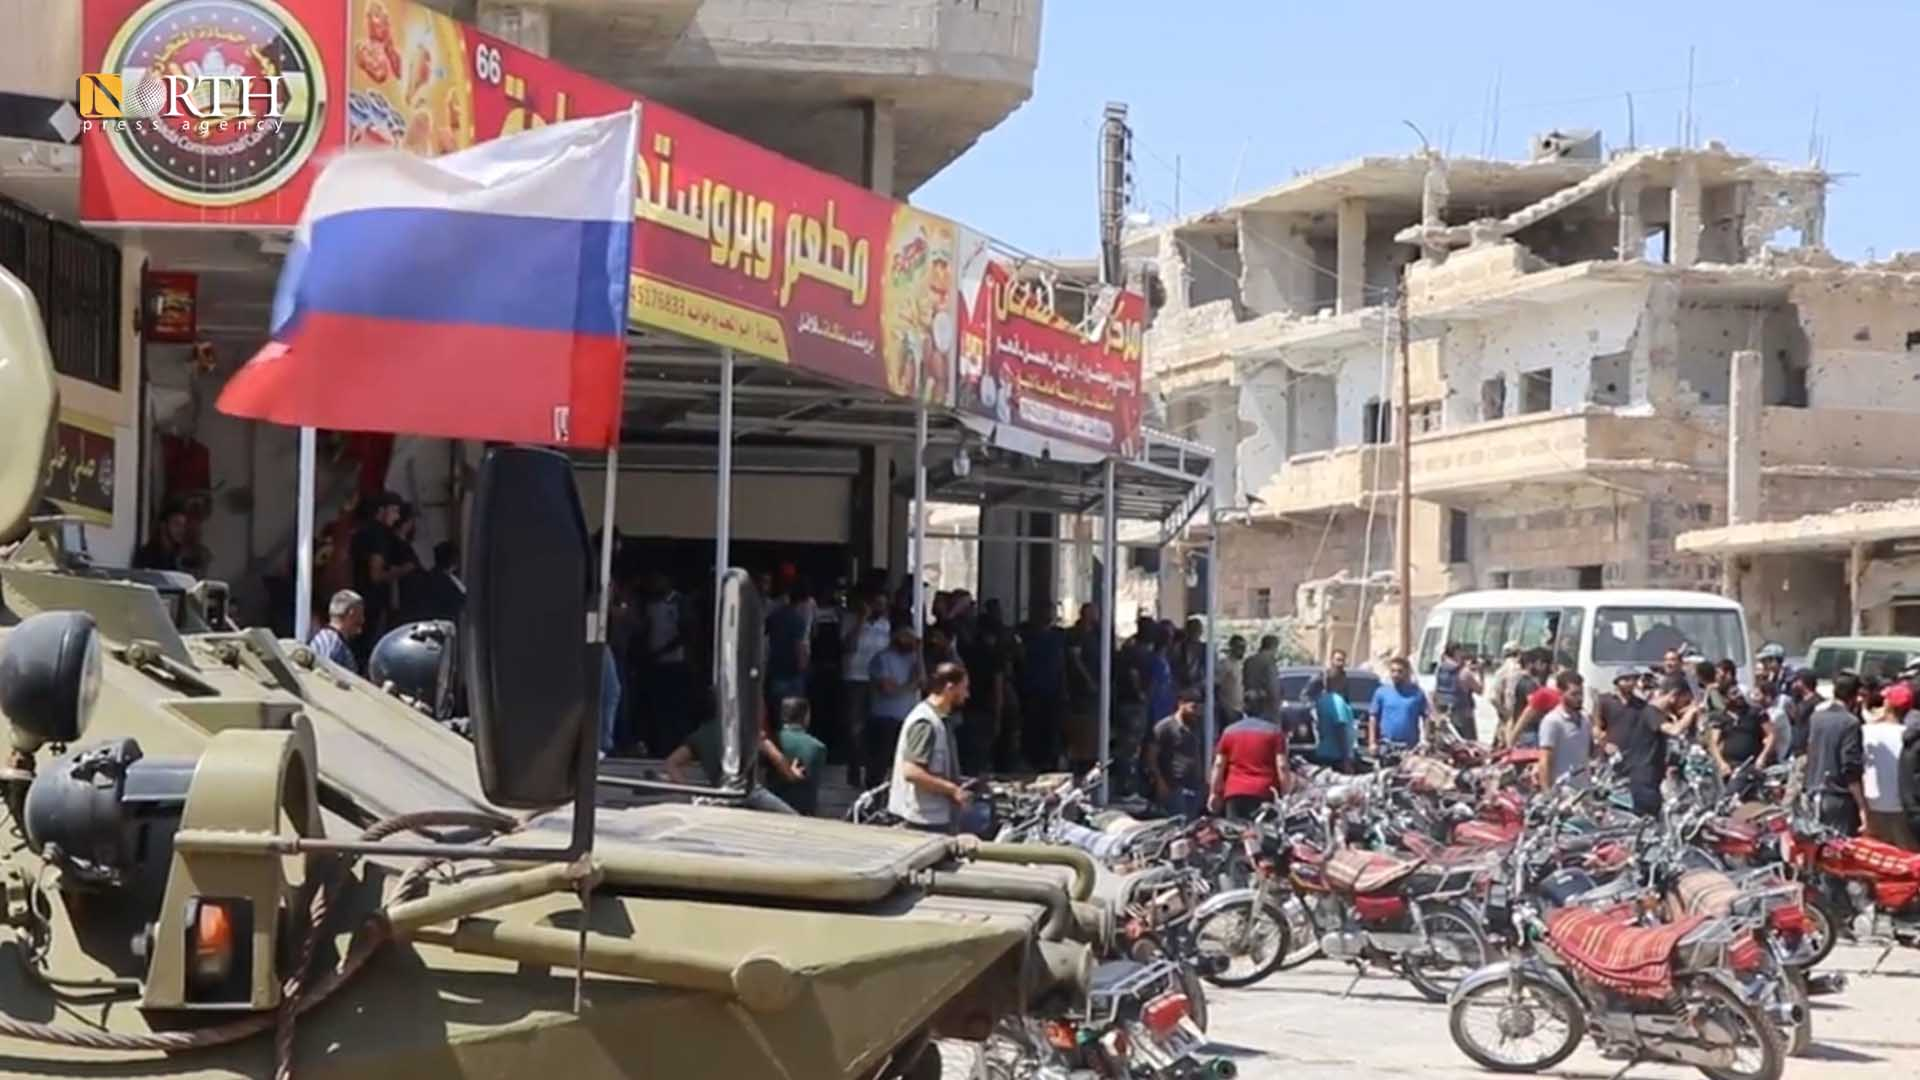 Settlement center in Daraa al-Balad – North Press